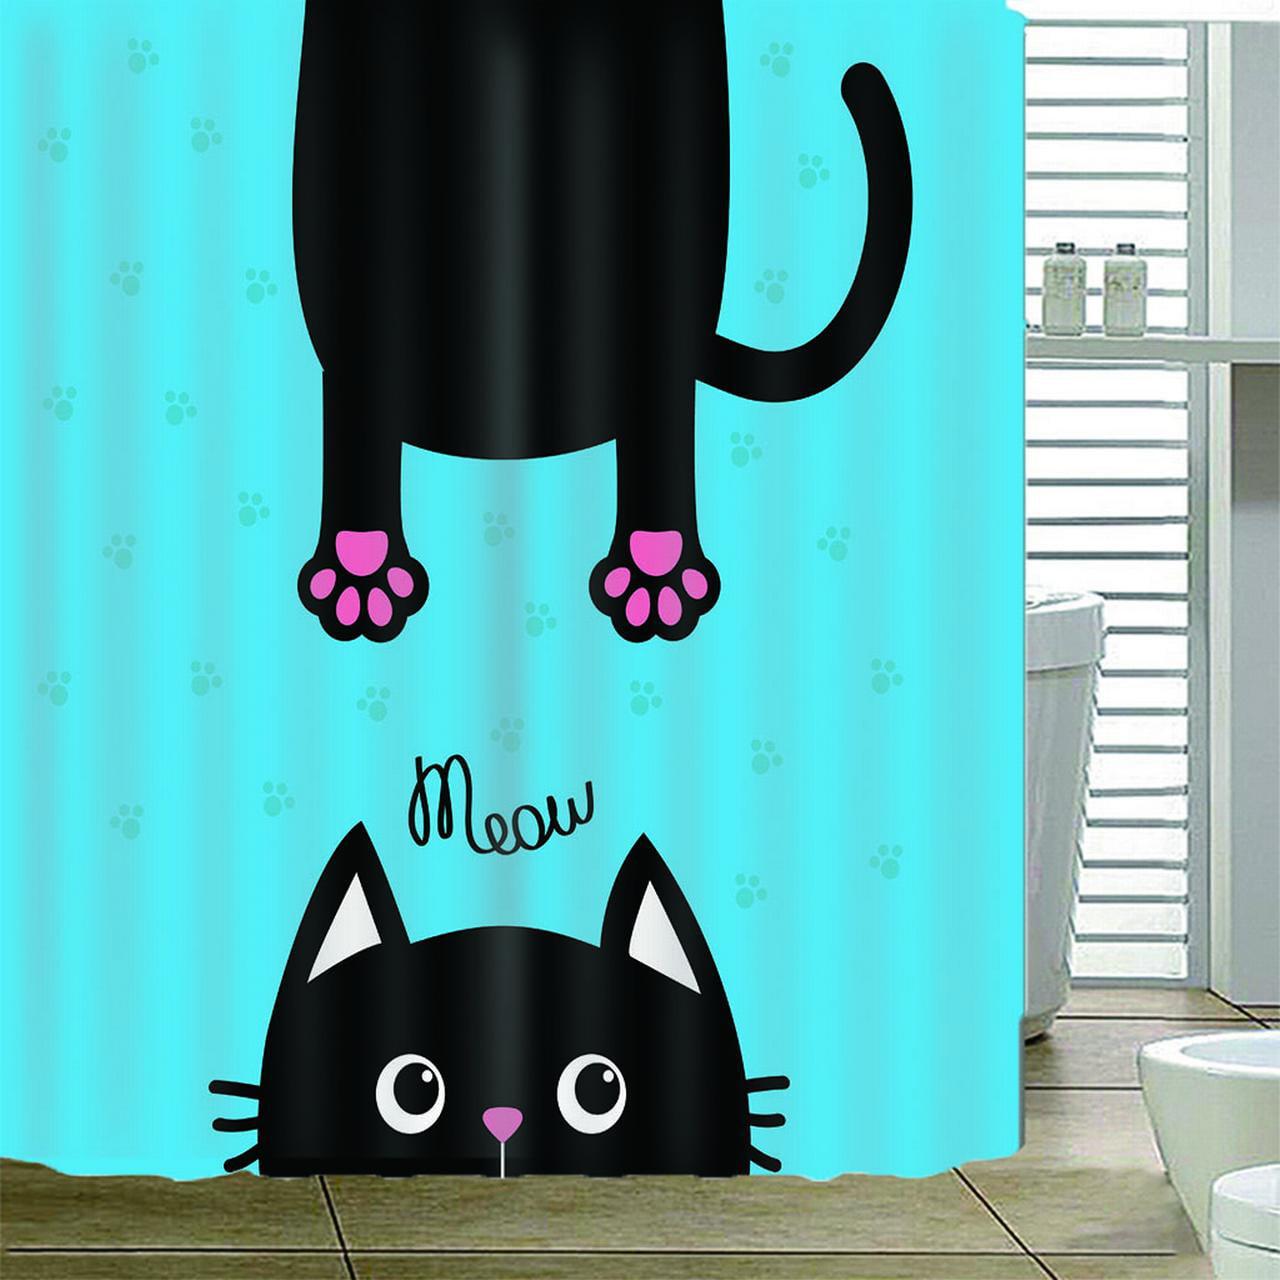 Cat Shower Curtain Set Cute Kitty Black Paw Print Purple Blue Meow Bathroom Decor Waterproof Polyester Fabric Accessories Bath Walmart Canada